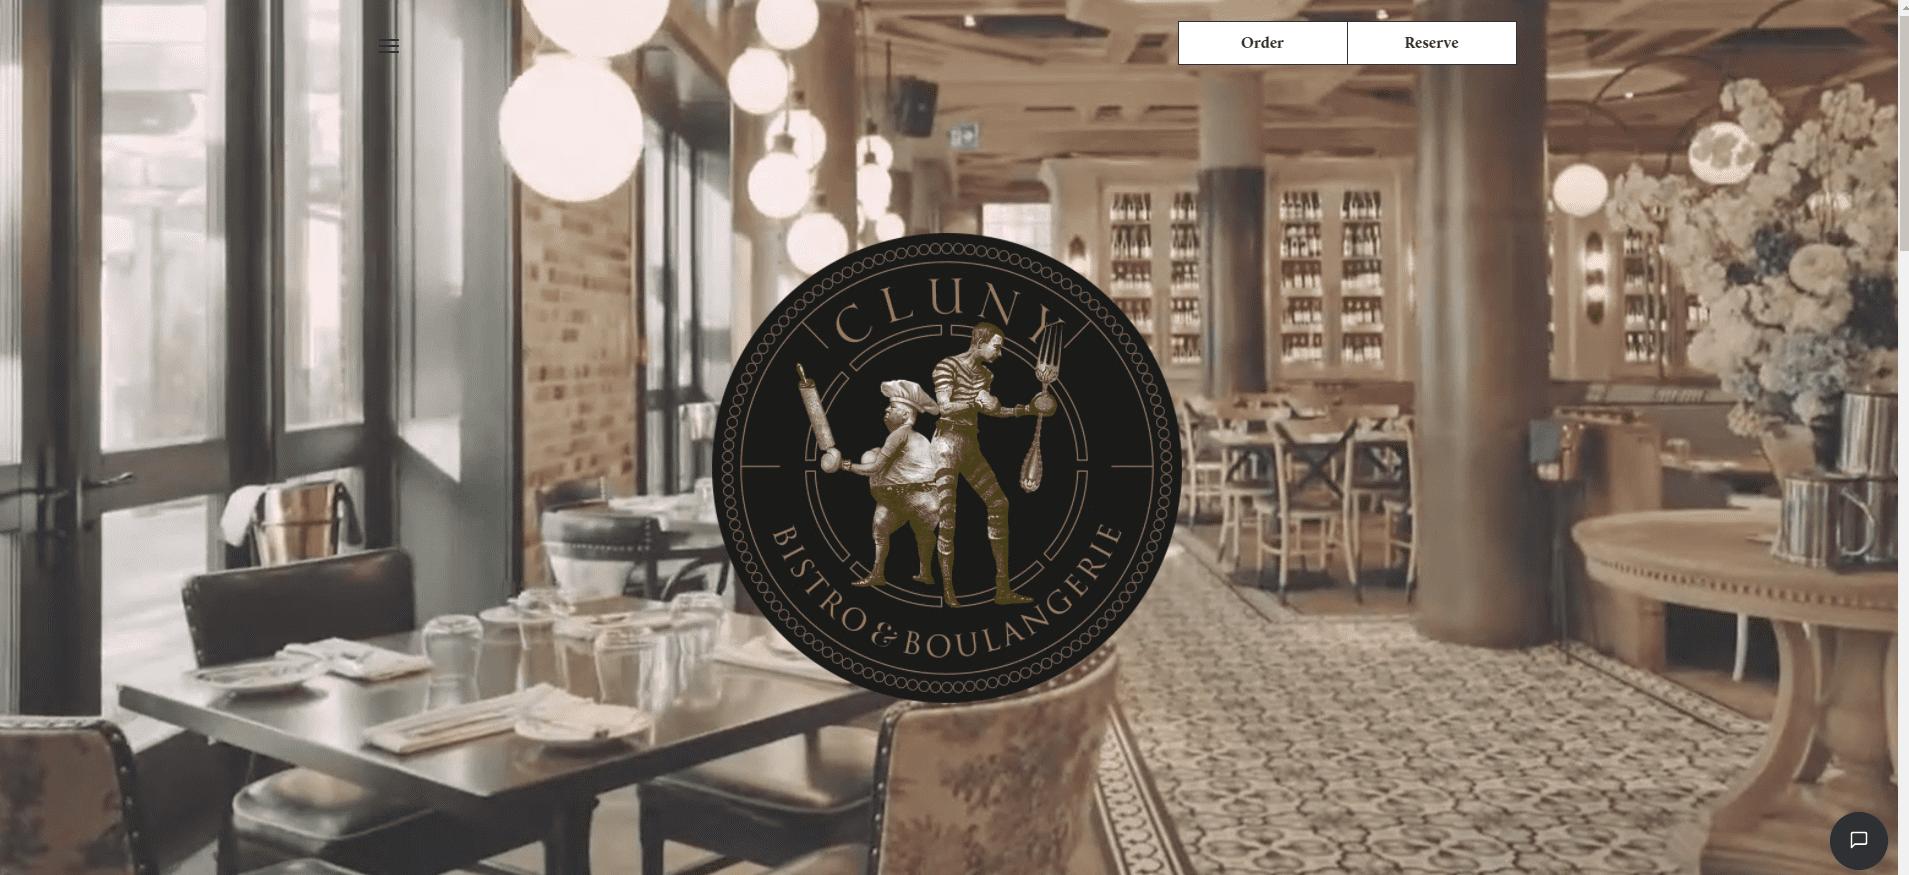 Cluny Bistro & Boulangerie restaurant websites